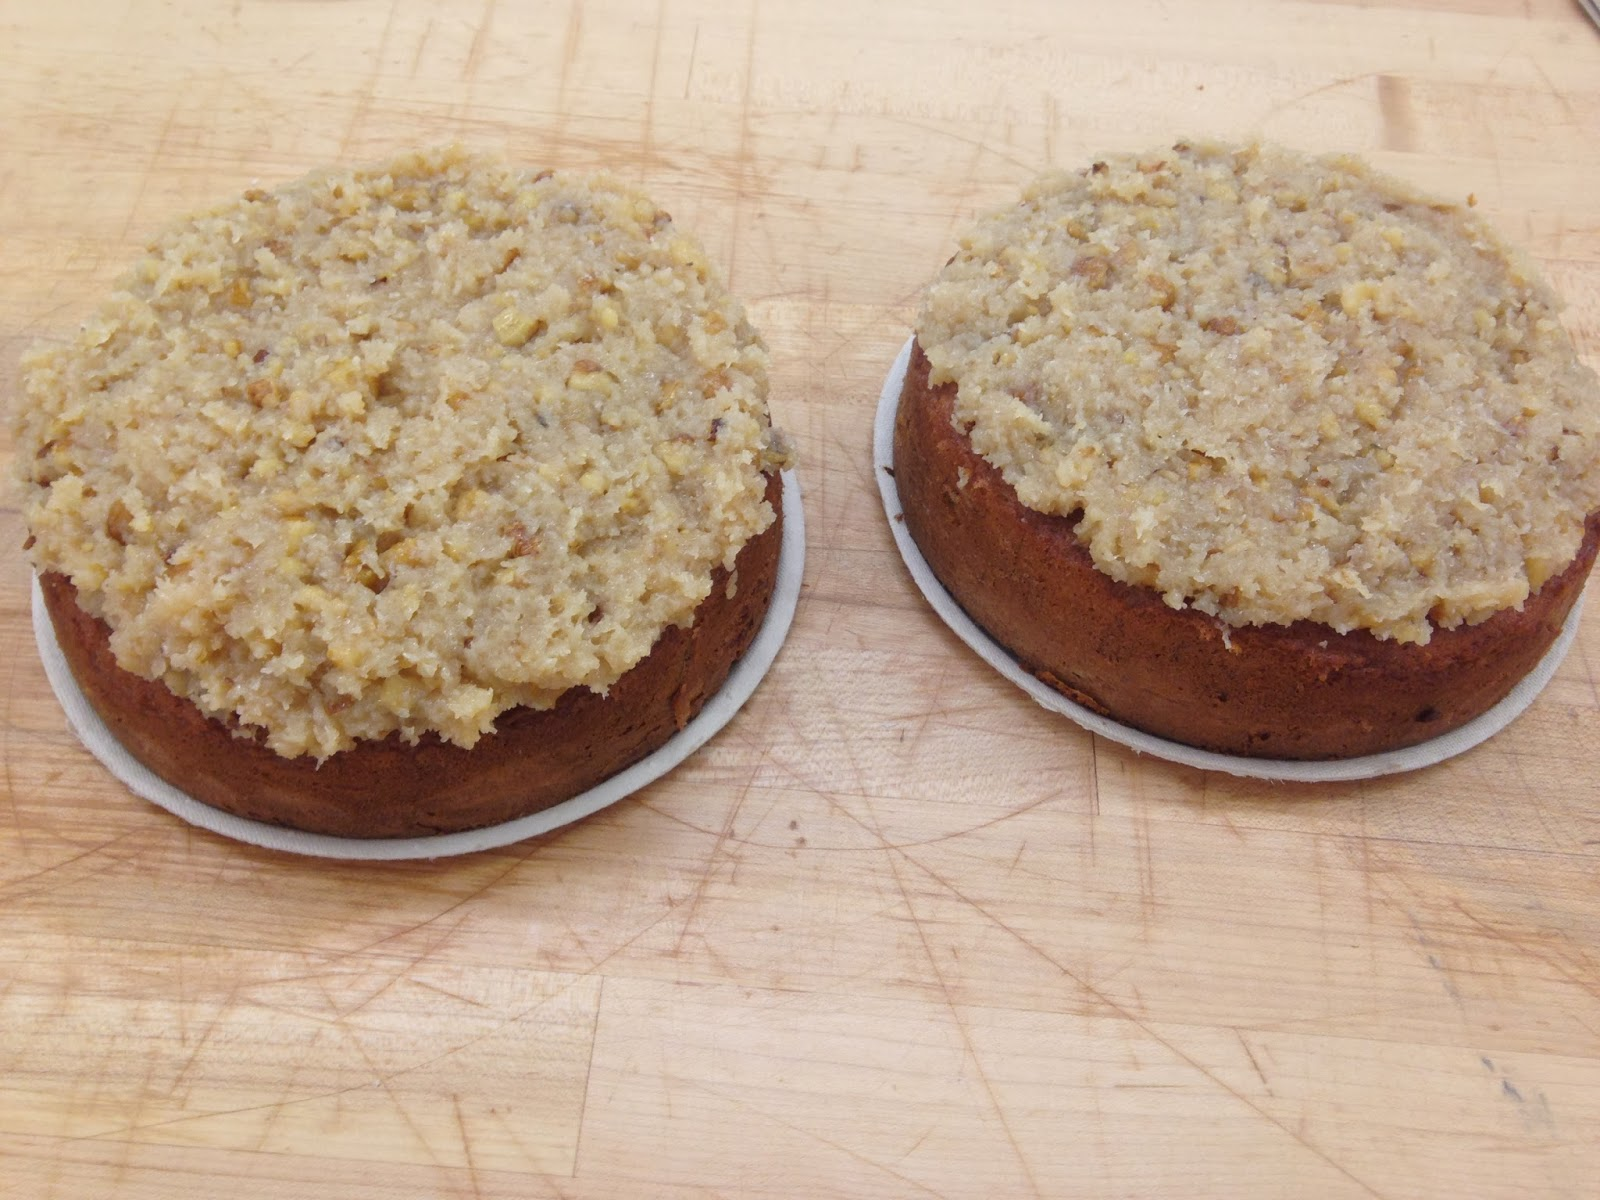 Crafting Baker: Week 3: Banana Cake with German Icing